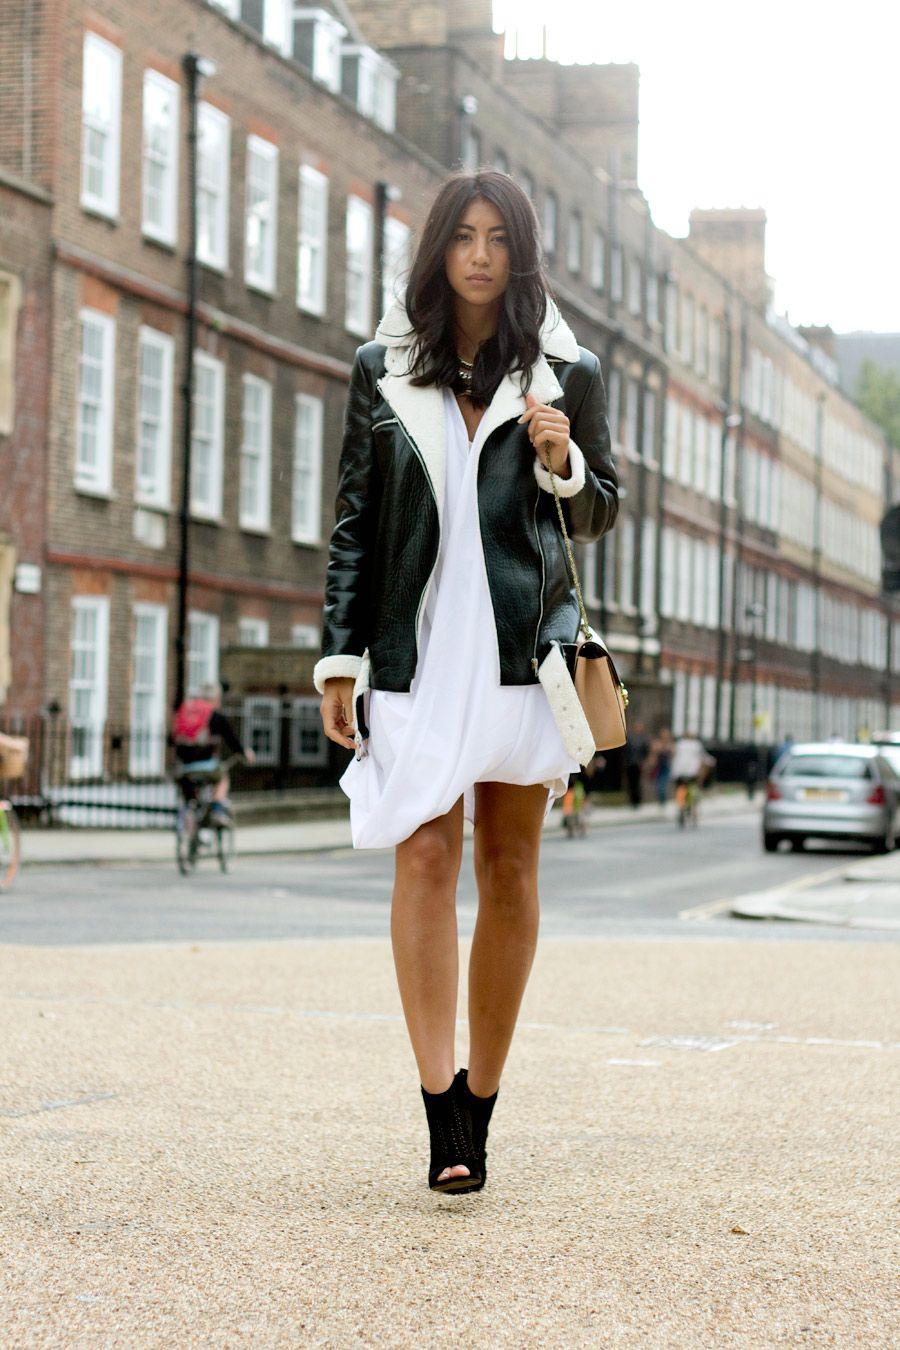 150bd99316a LFW Day 3: Falling for London | Not Your Standard Berlin Fashion, Net  Fashion